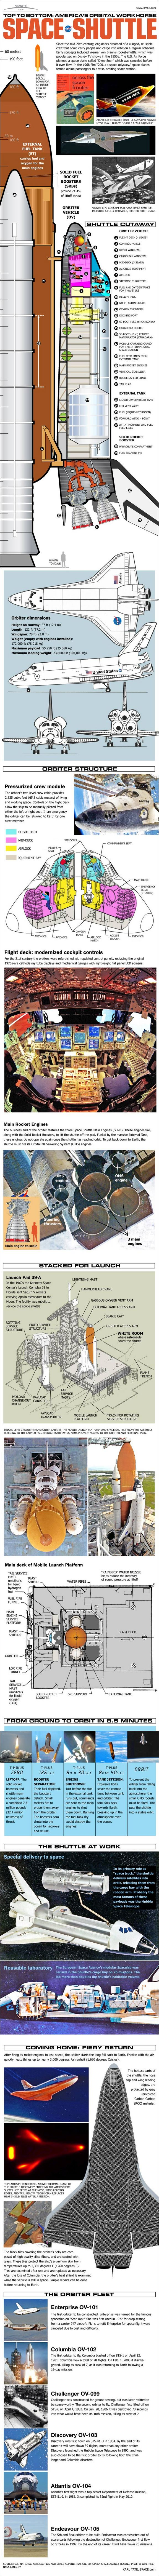 A graphical representative of NASA's space shuttle.